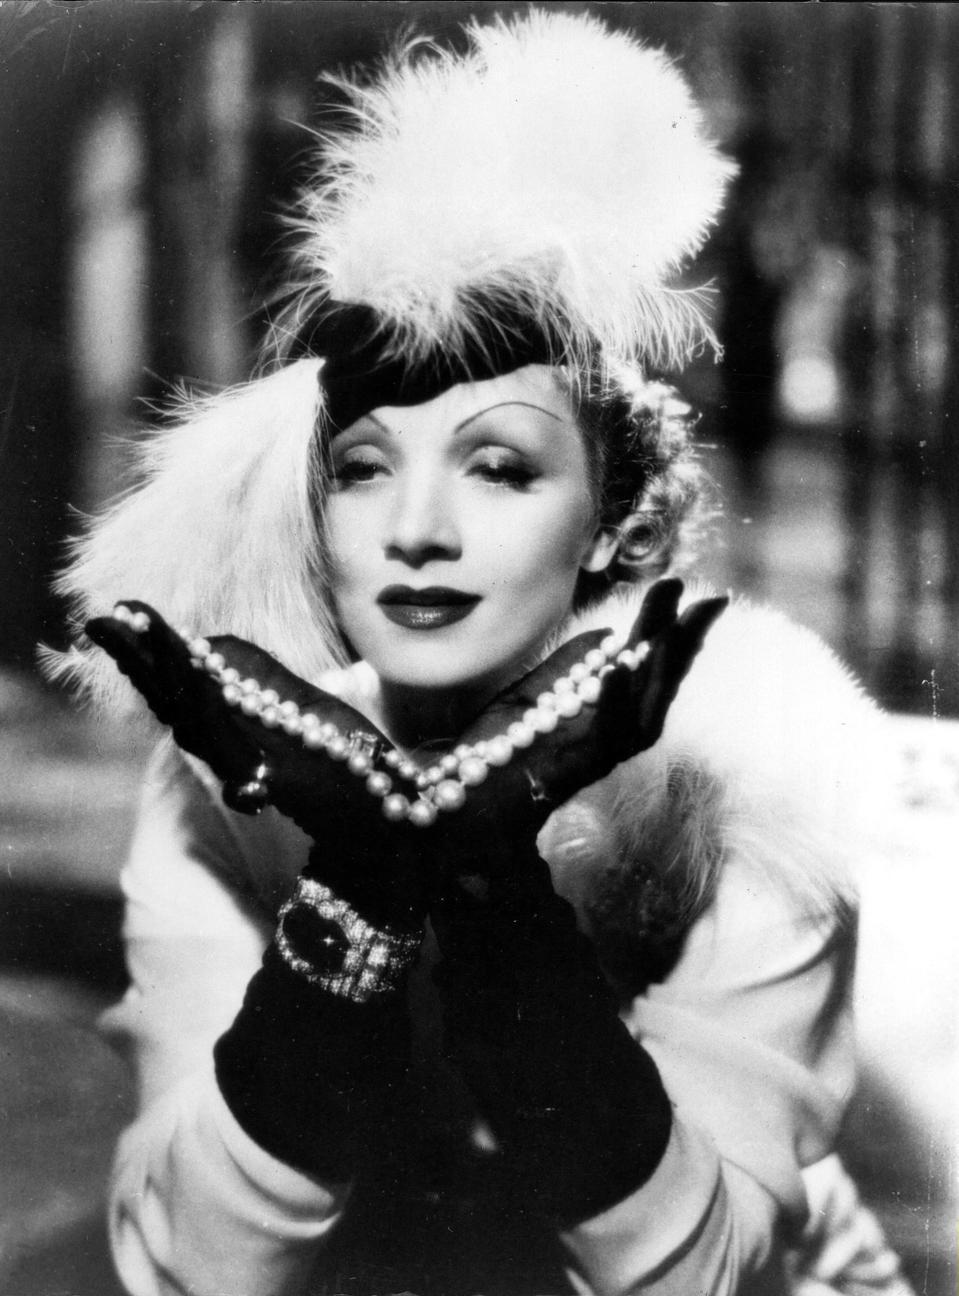 Dietrich, Marlene - Actress, Germany -   (*27.12.1901-06.05.1992+)   Scene from